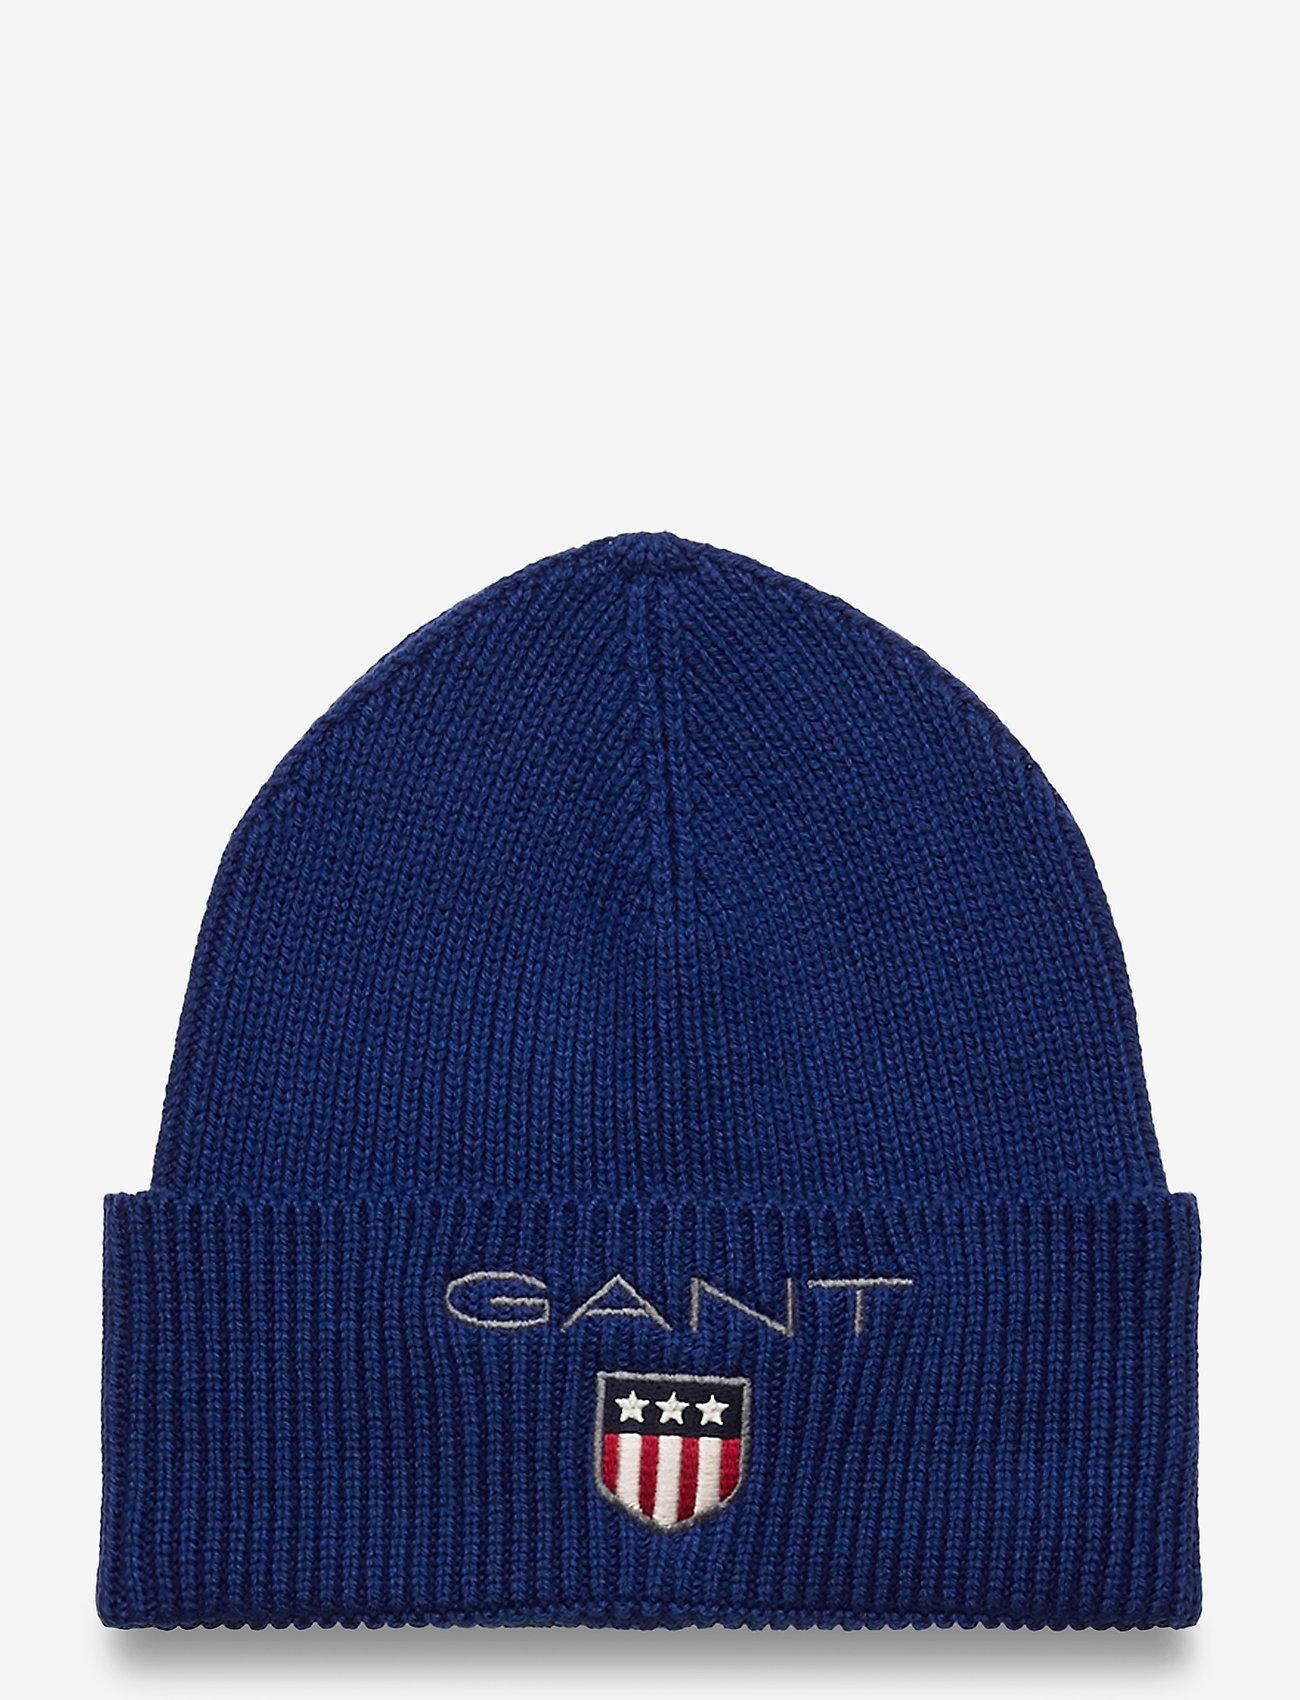 GANT - D1. MEDIUM SHIELD RIB BEANIE - hats - strong blue - 0